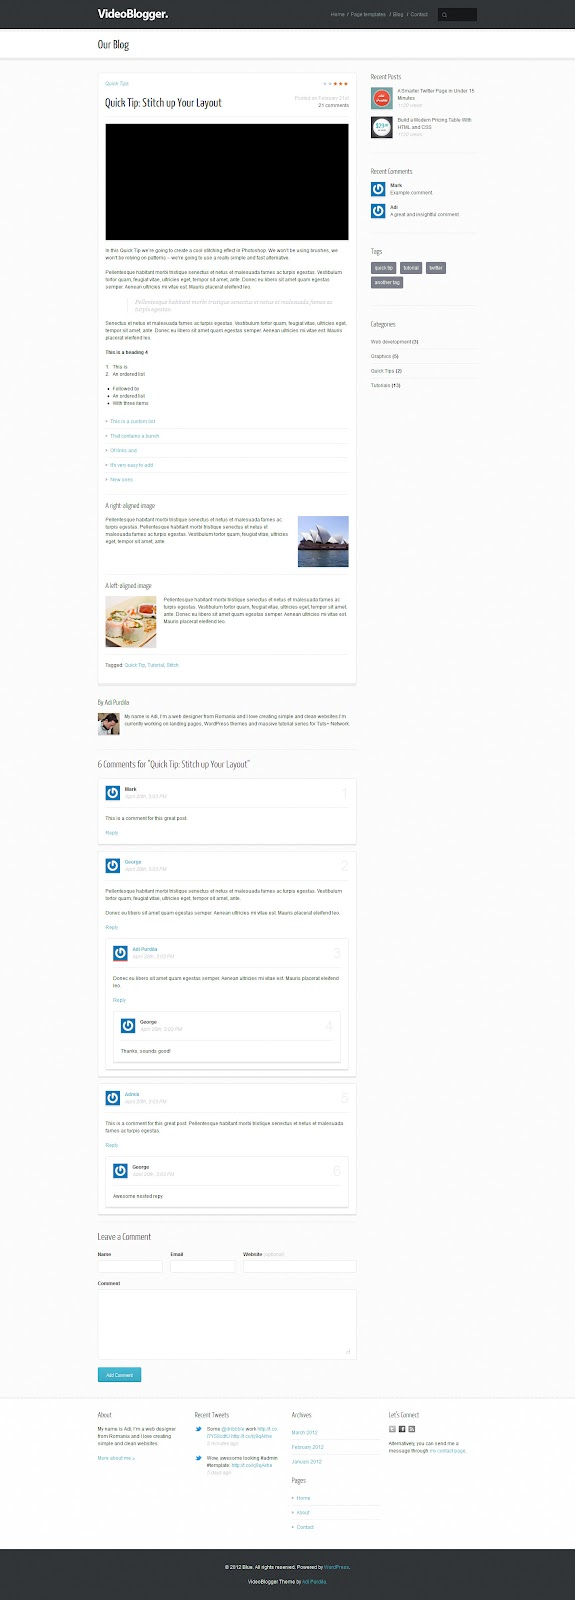 VideoBlogger-HTML-Video-Blog-Templates